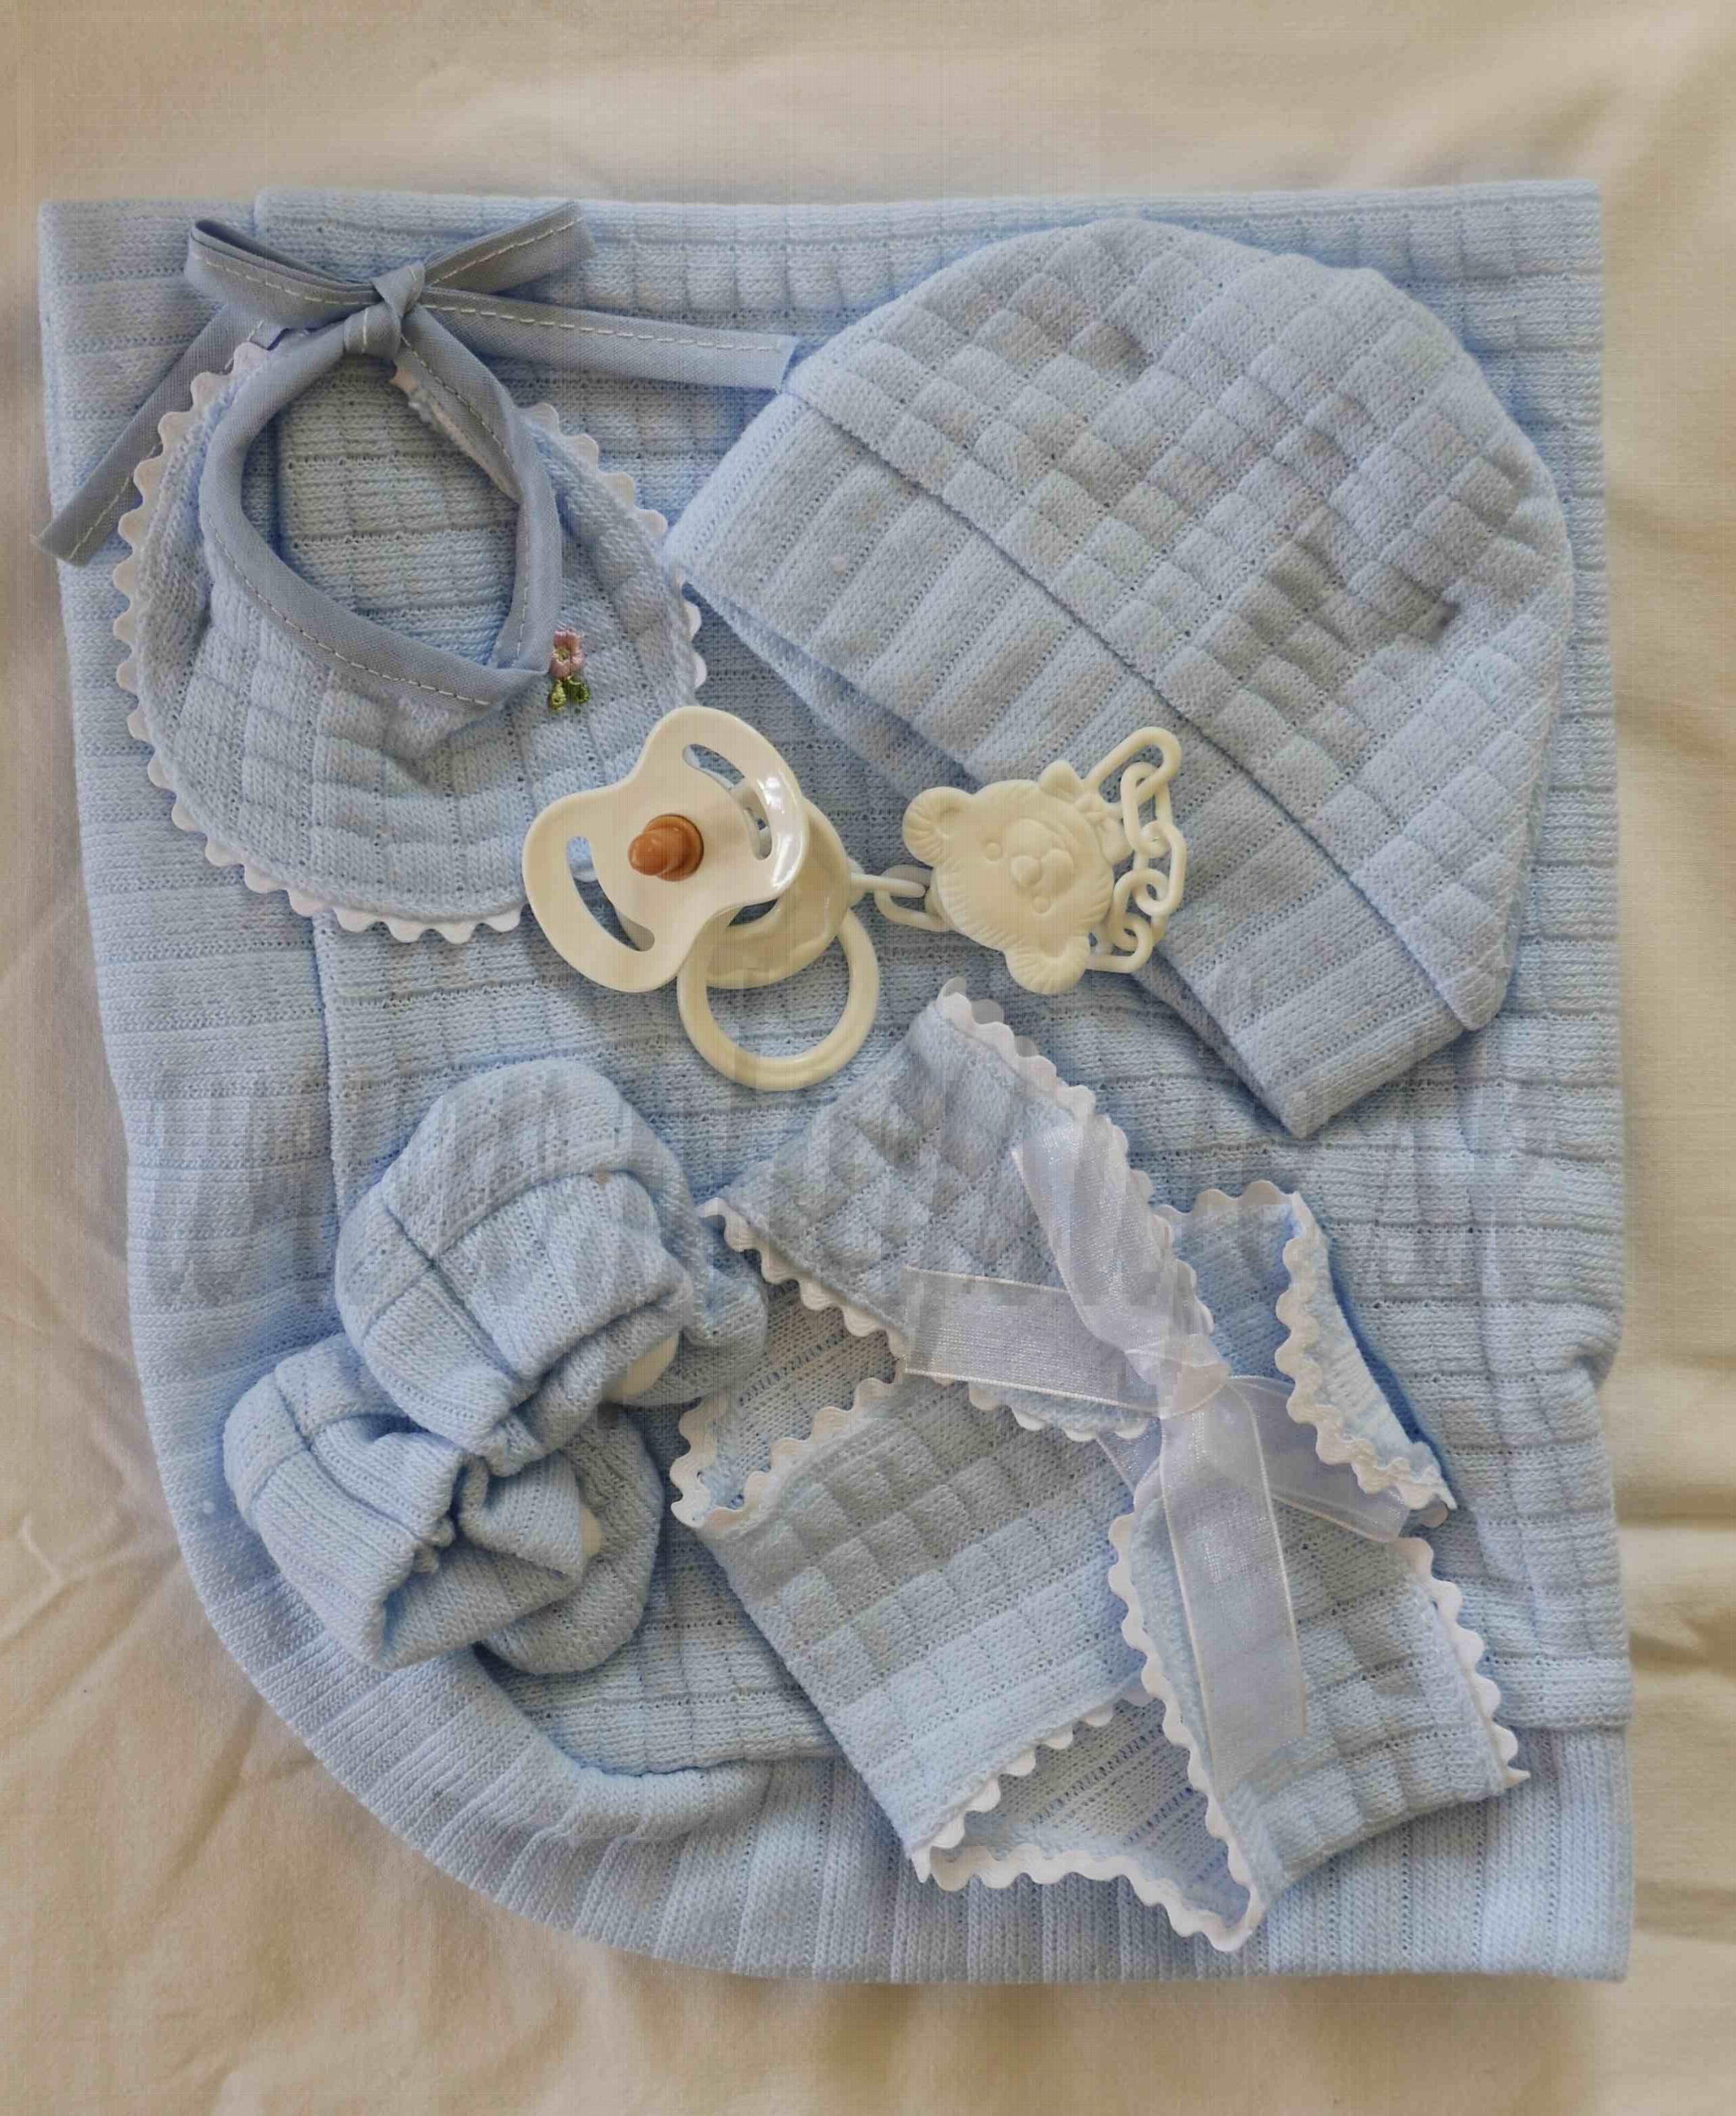 Antonio Juan Baby Doll Accessories Set 40-42cm blue 2